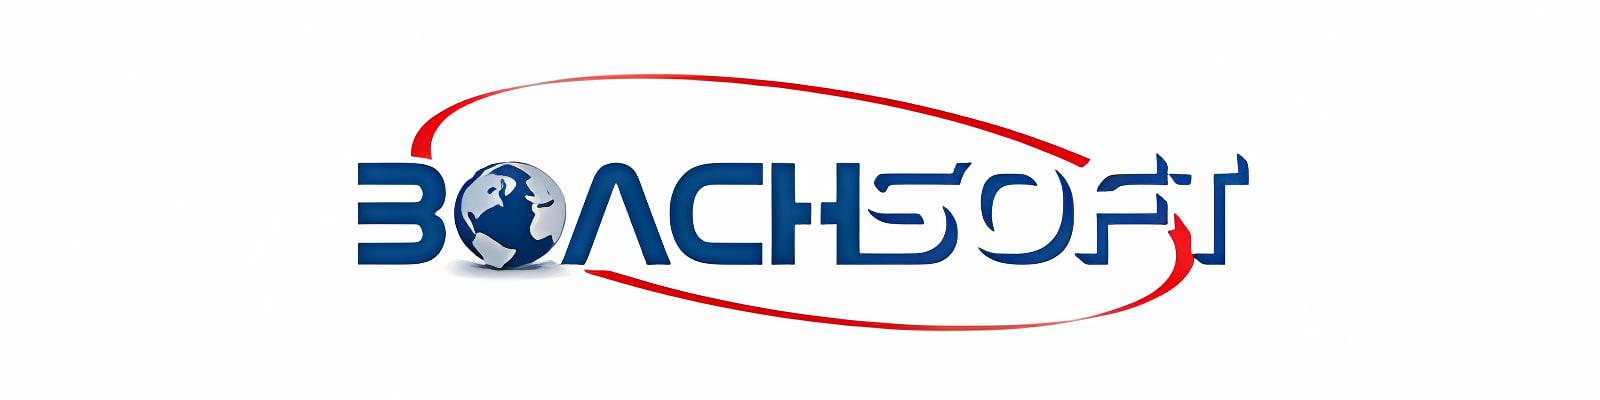 Boachsoft Finance  2012